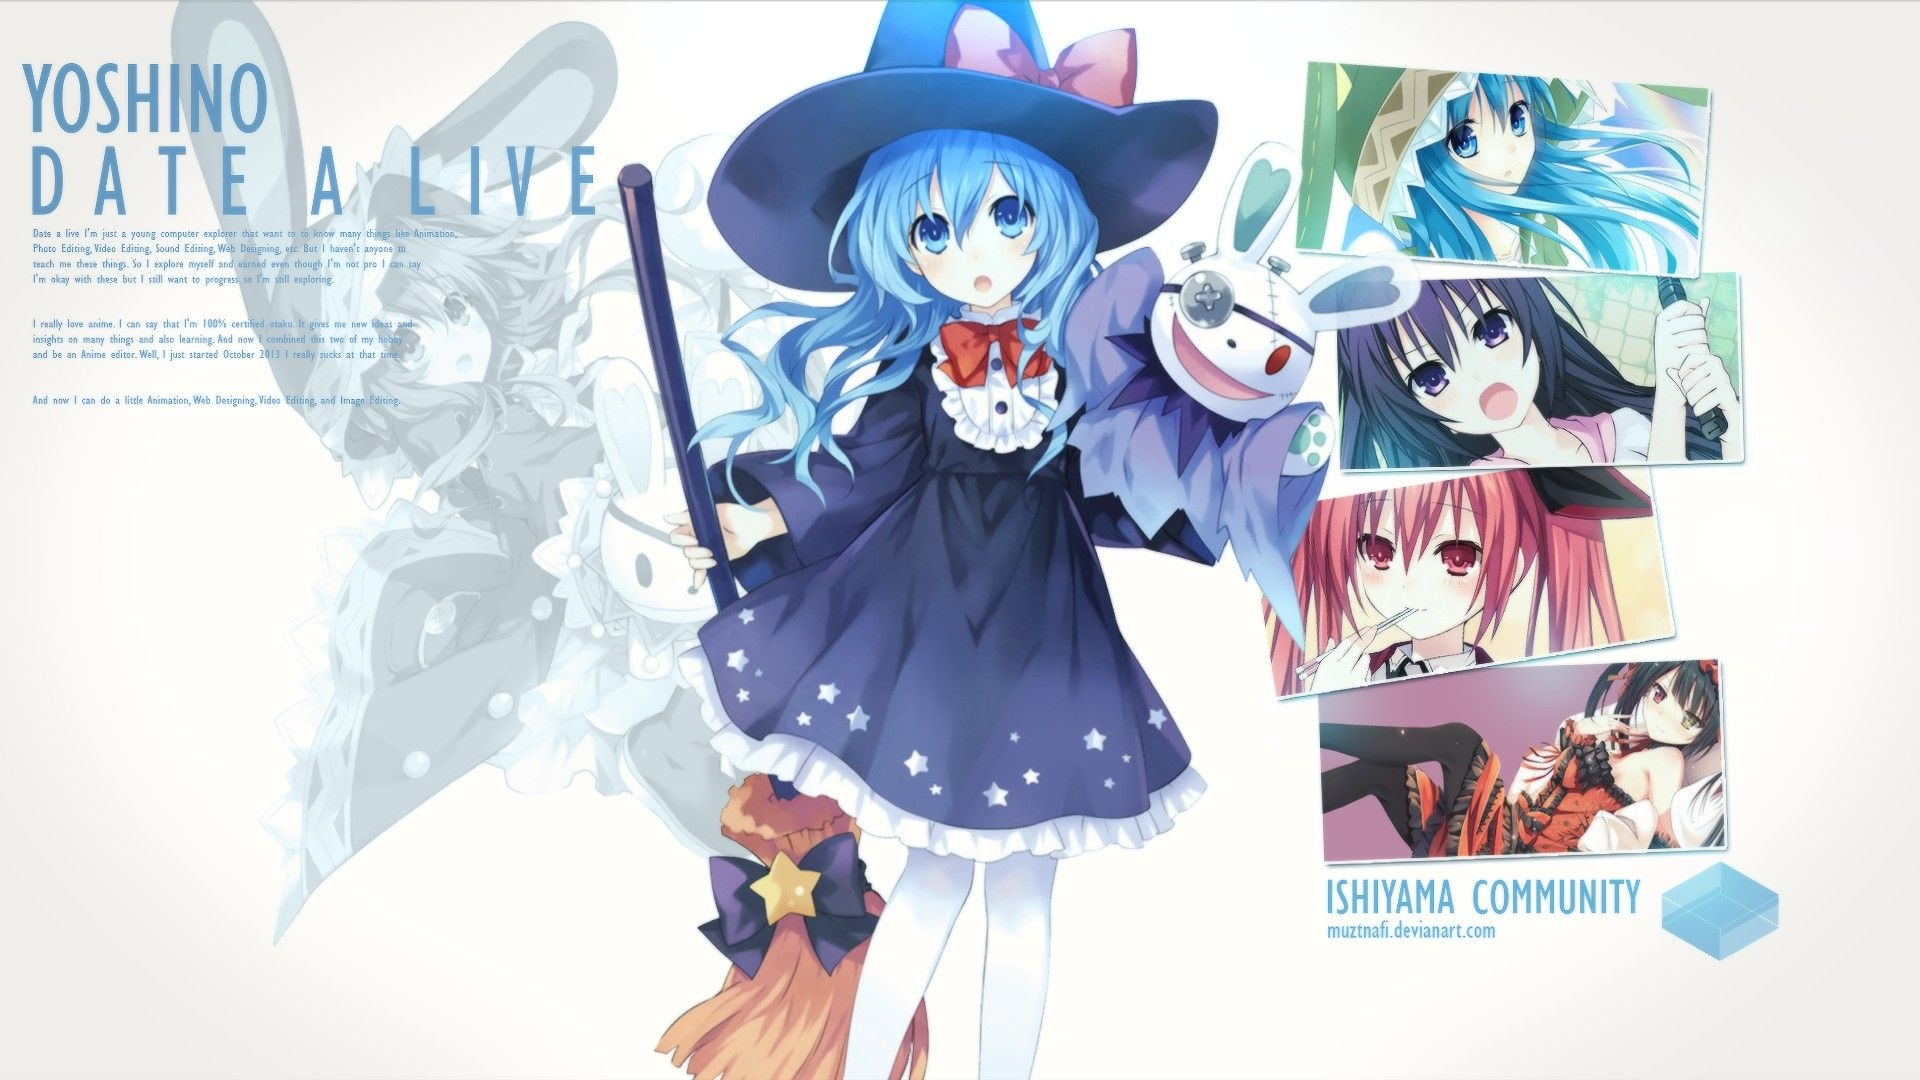 Free Anime Live Wallpaper Date A Live Yoshino Fanart 63241